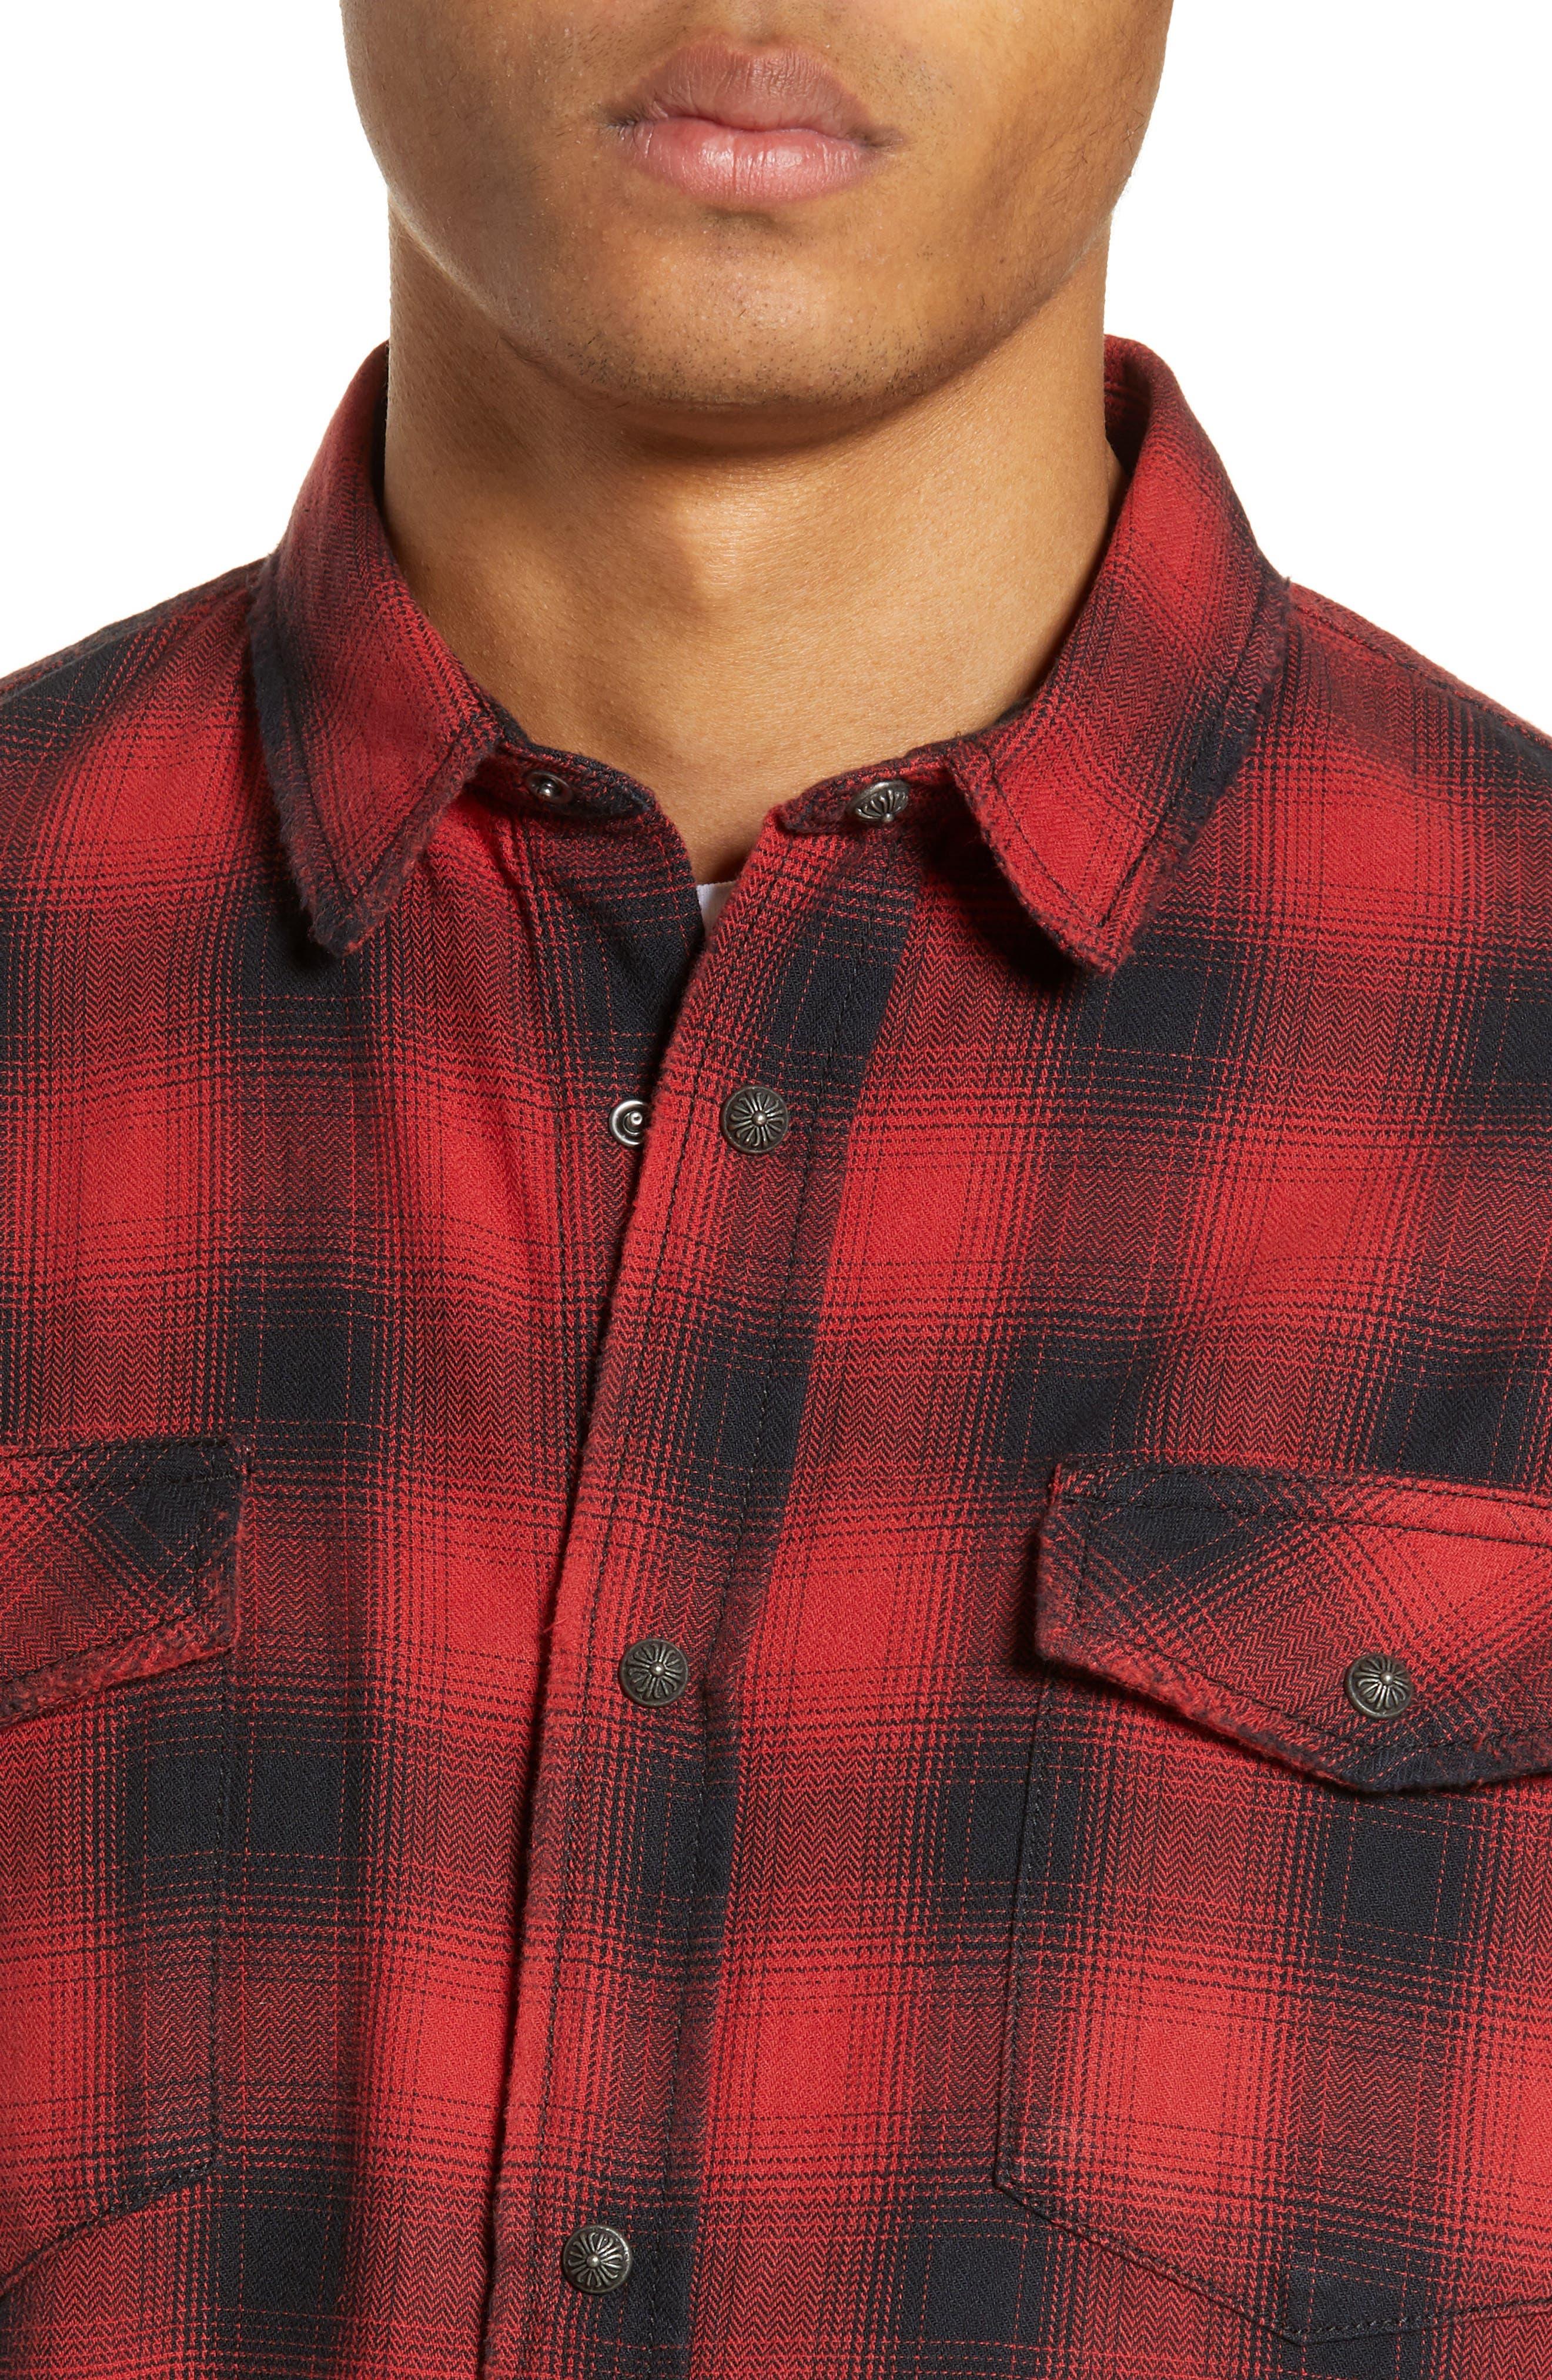 THE KOOPLES, Regular Fit Ombré Plaid Shirt, Alternate thumbnail 2, color, RED / BLACK